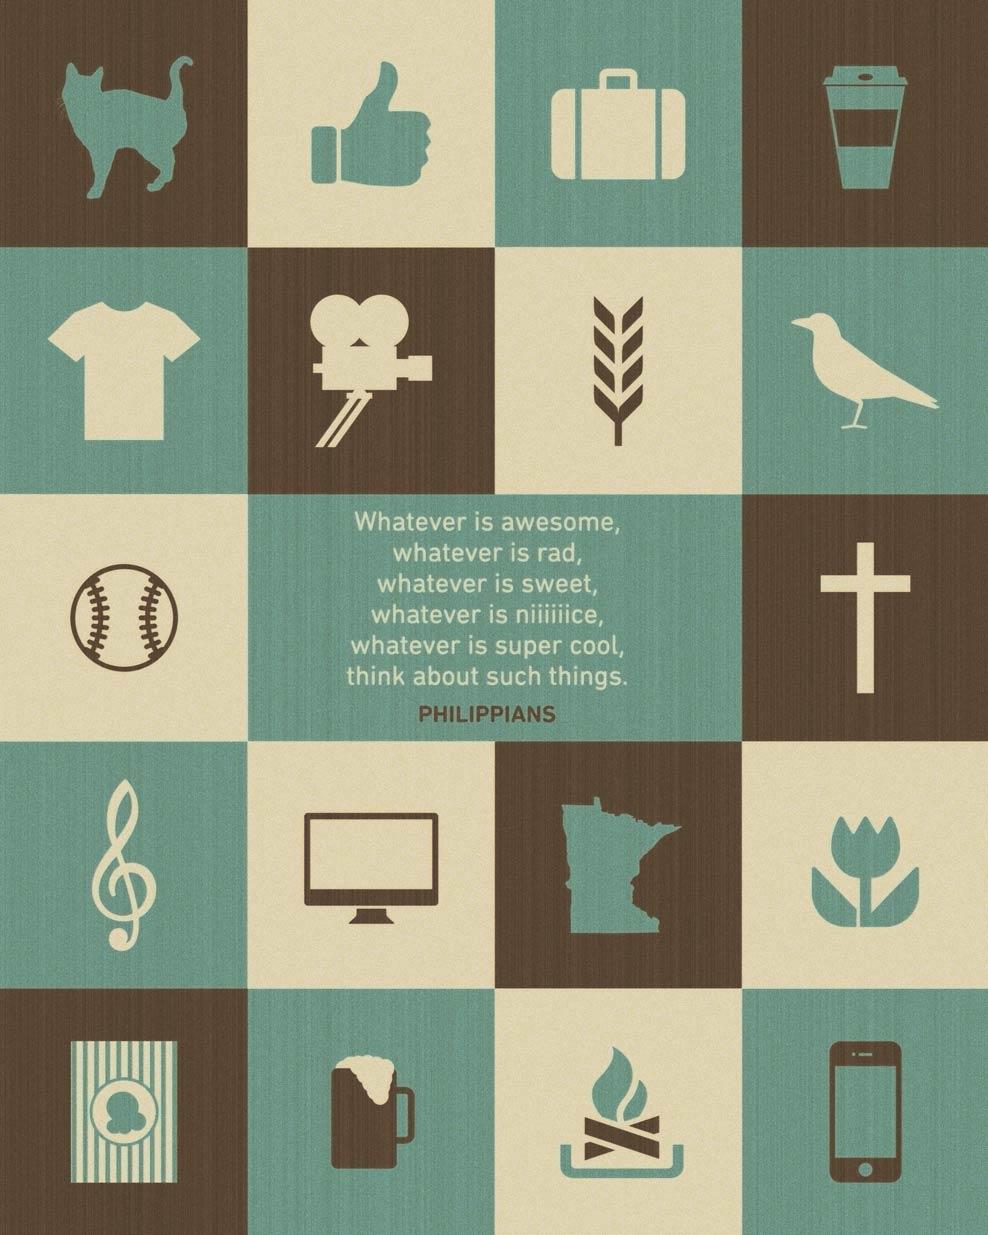 Philippians_988.jpg